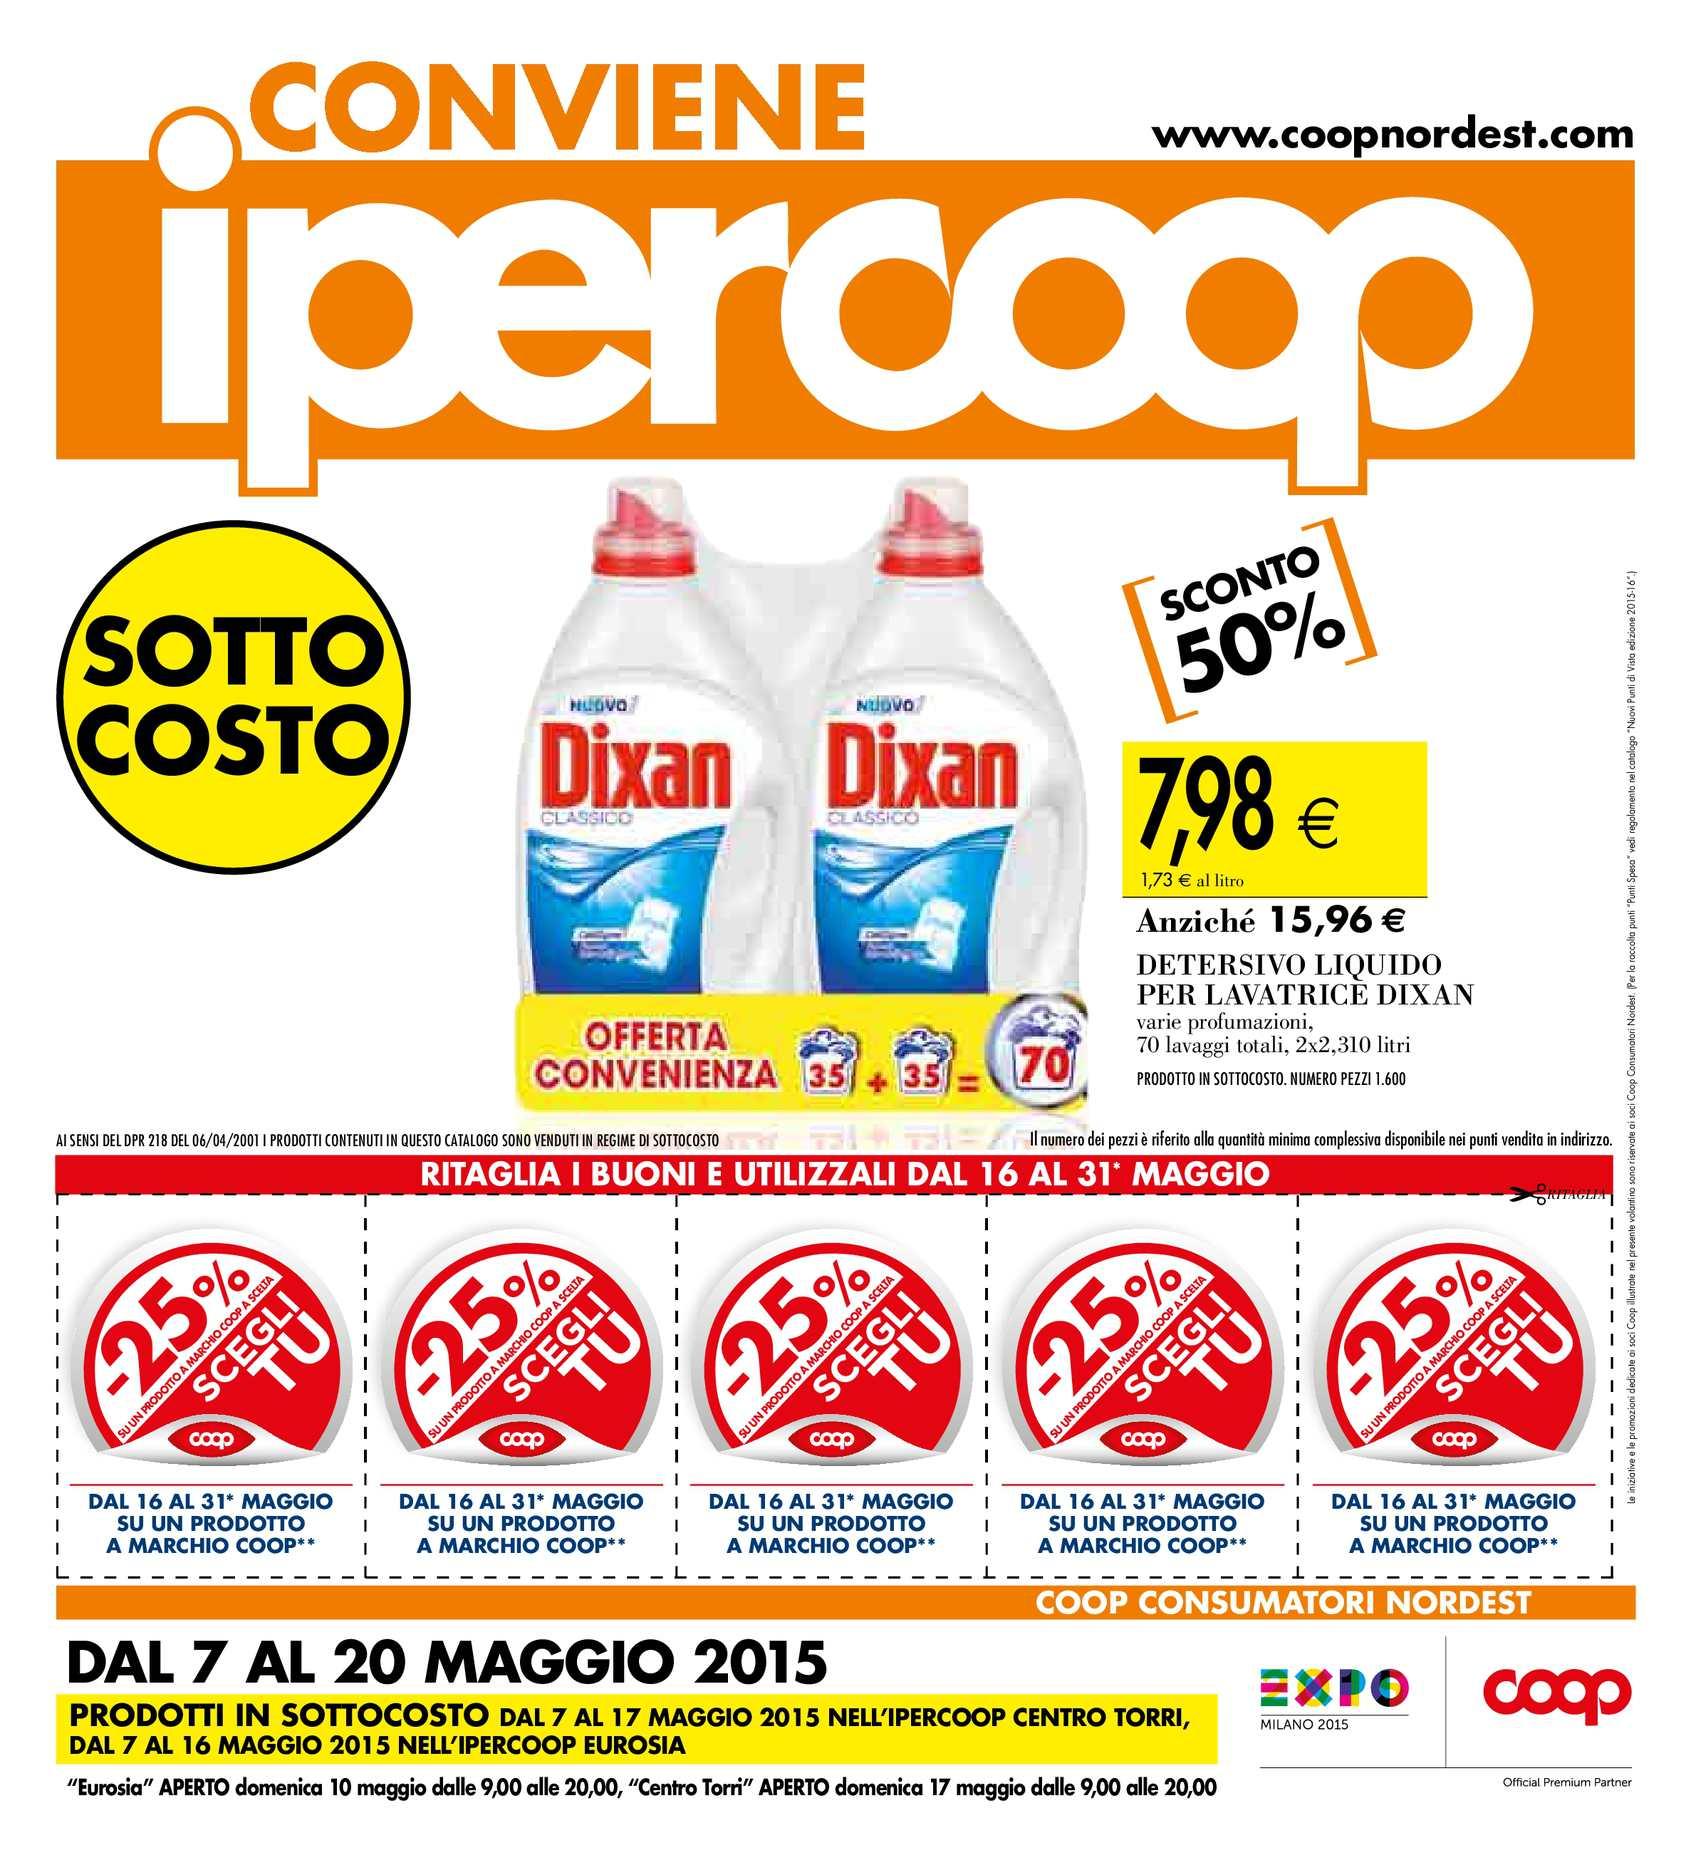 Emejing Ipercoop Le Terrazze Volantino Pictures - Amazing Design ...